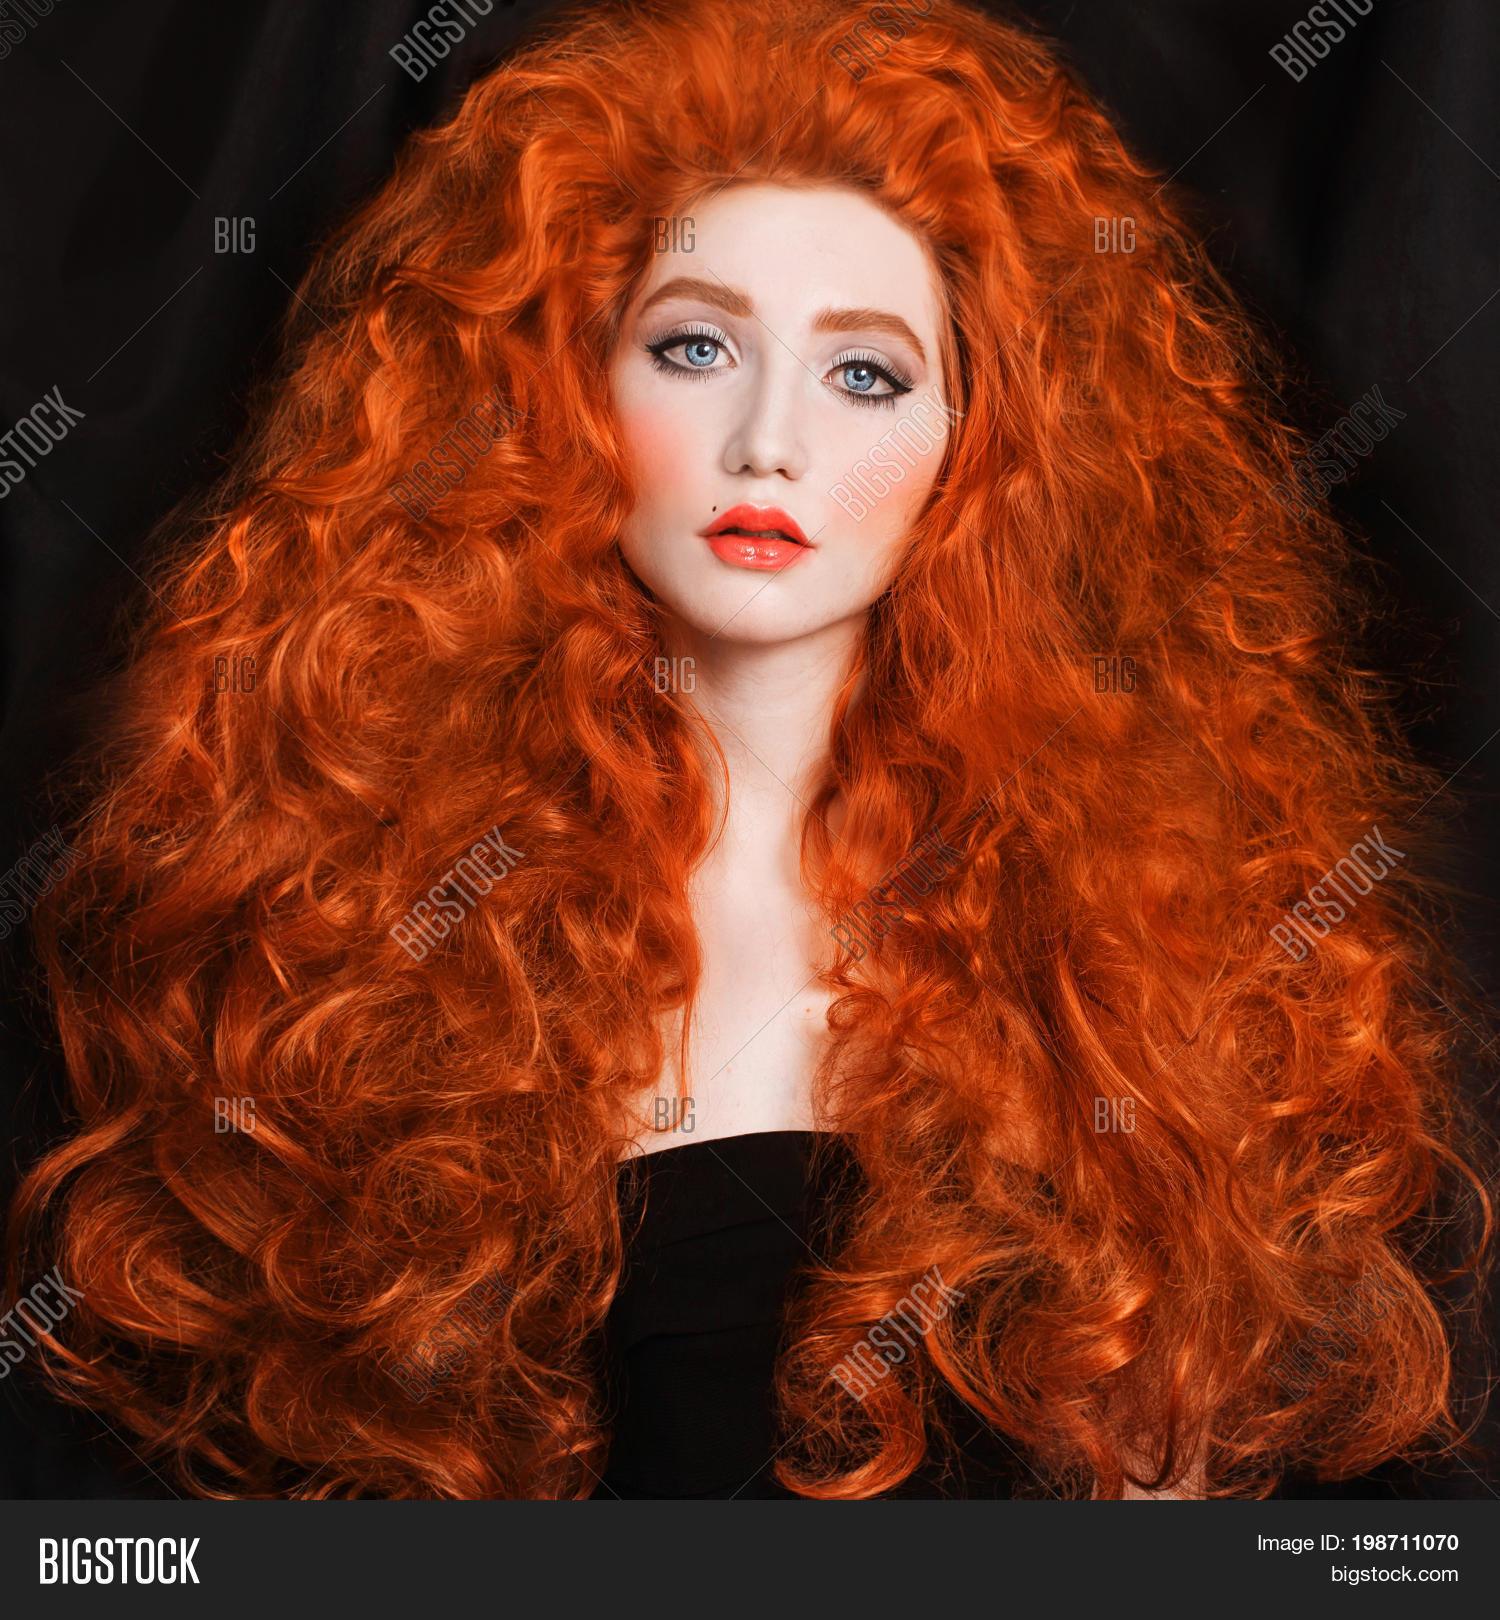 redhead woman very long curly hair image amp photo bigstock